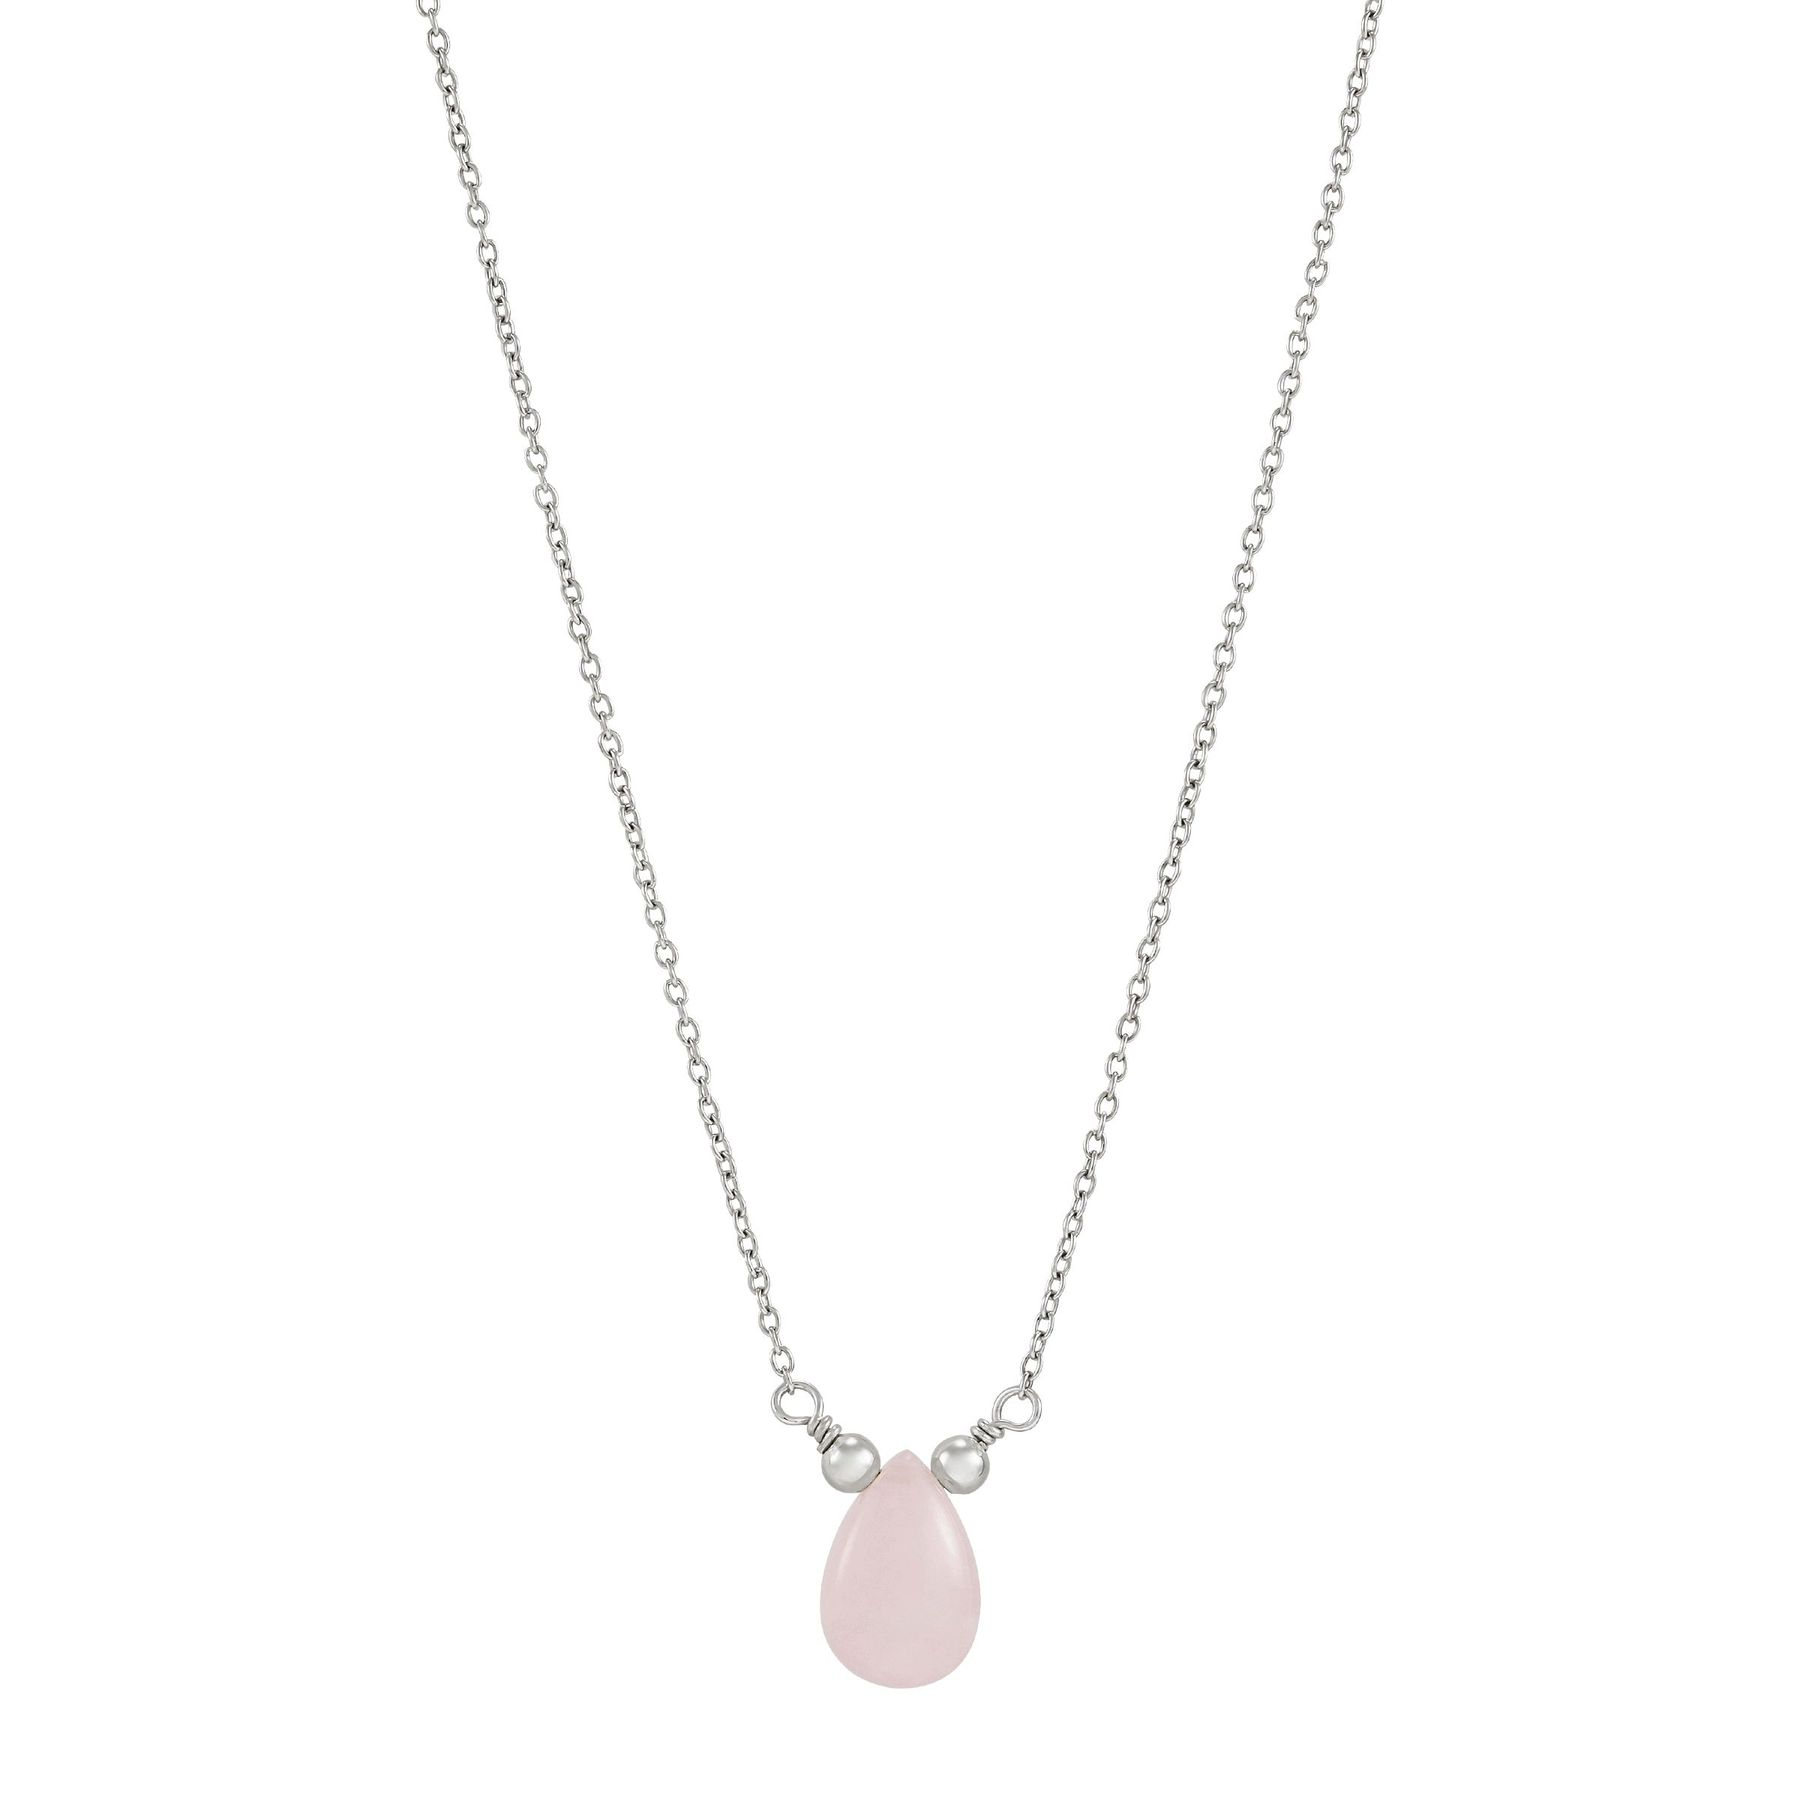 Rose Quartz Pendant Rose Gold Sterling Silver Necklace